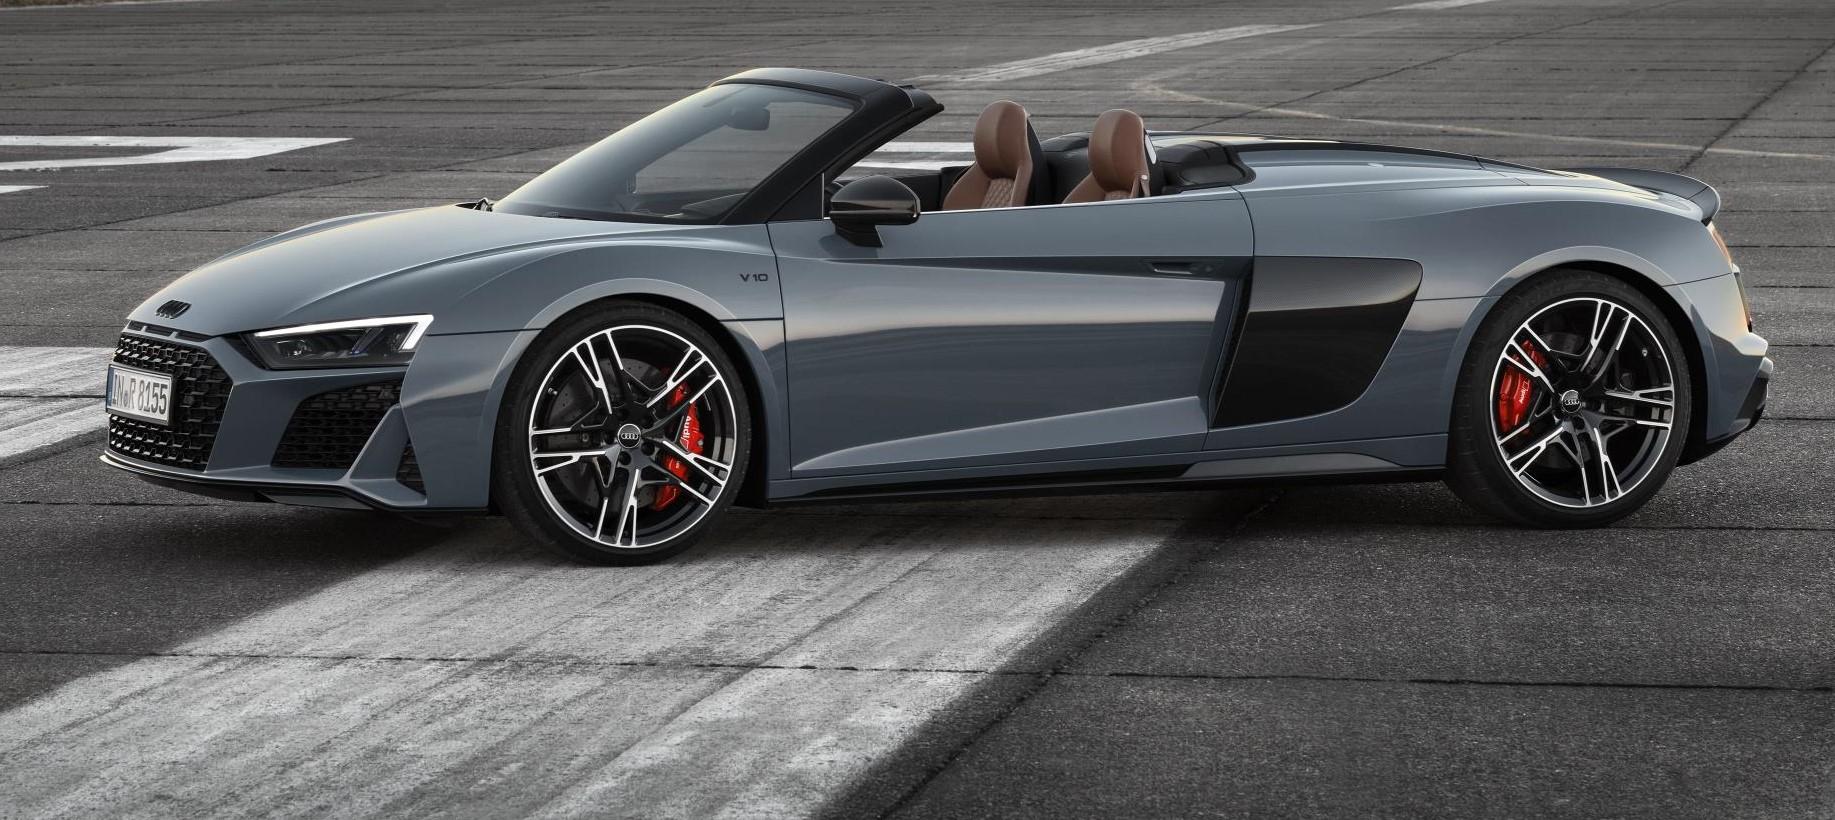 2020 Audi R8 V10 Performance Spyder 5676 Myautoworld Com